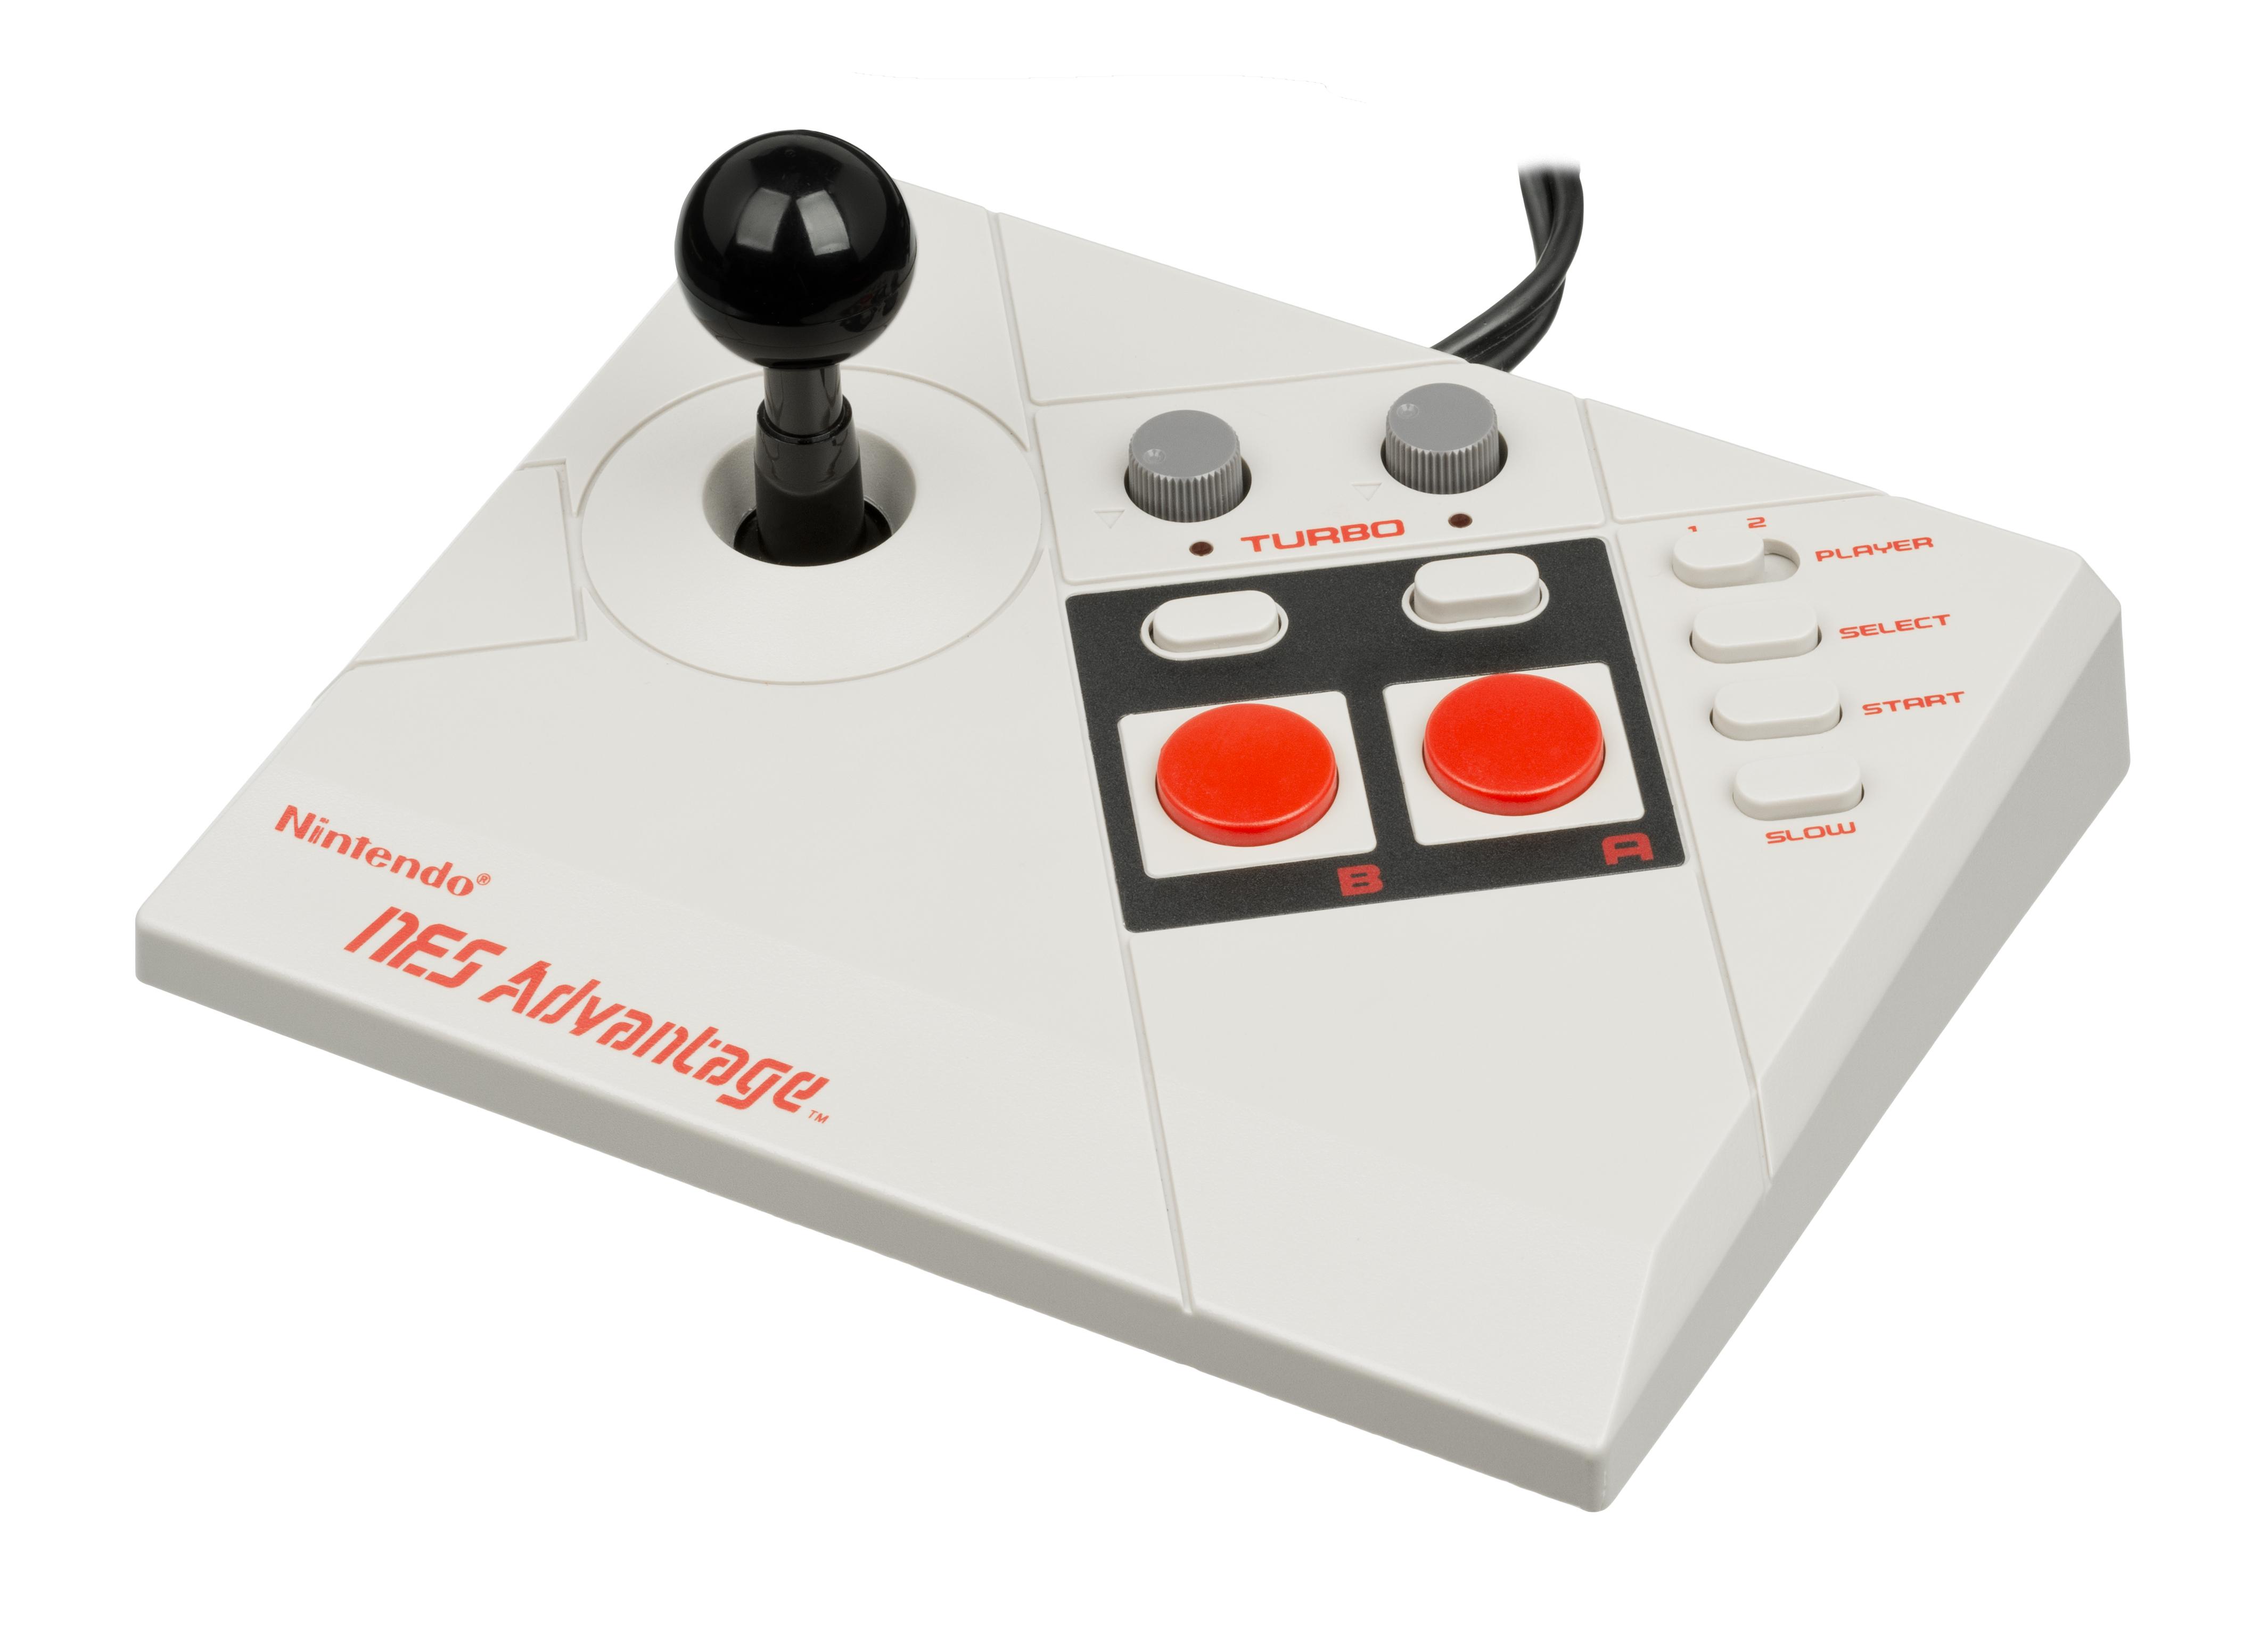 NES Advantage - Wikipedia